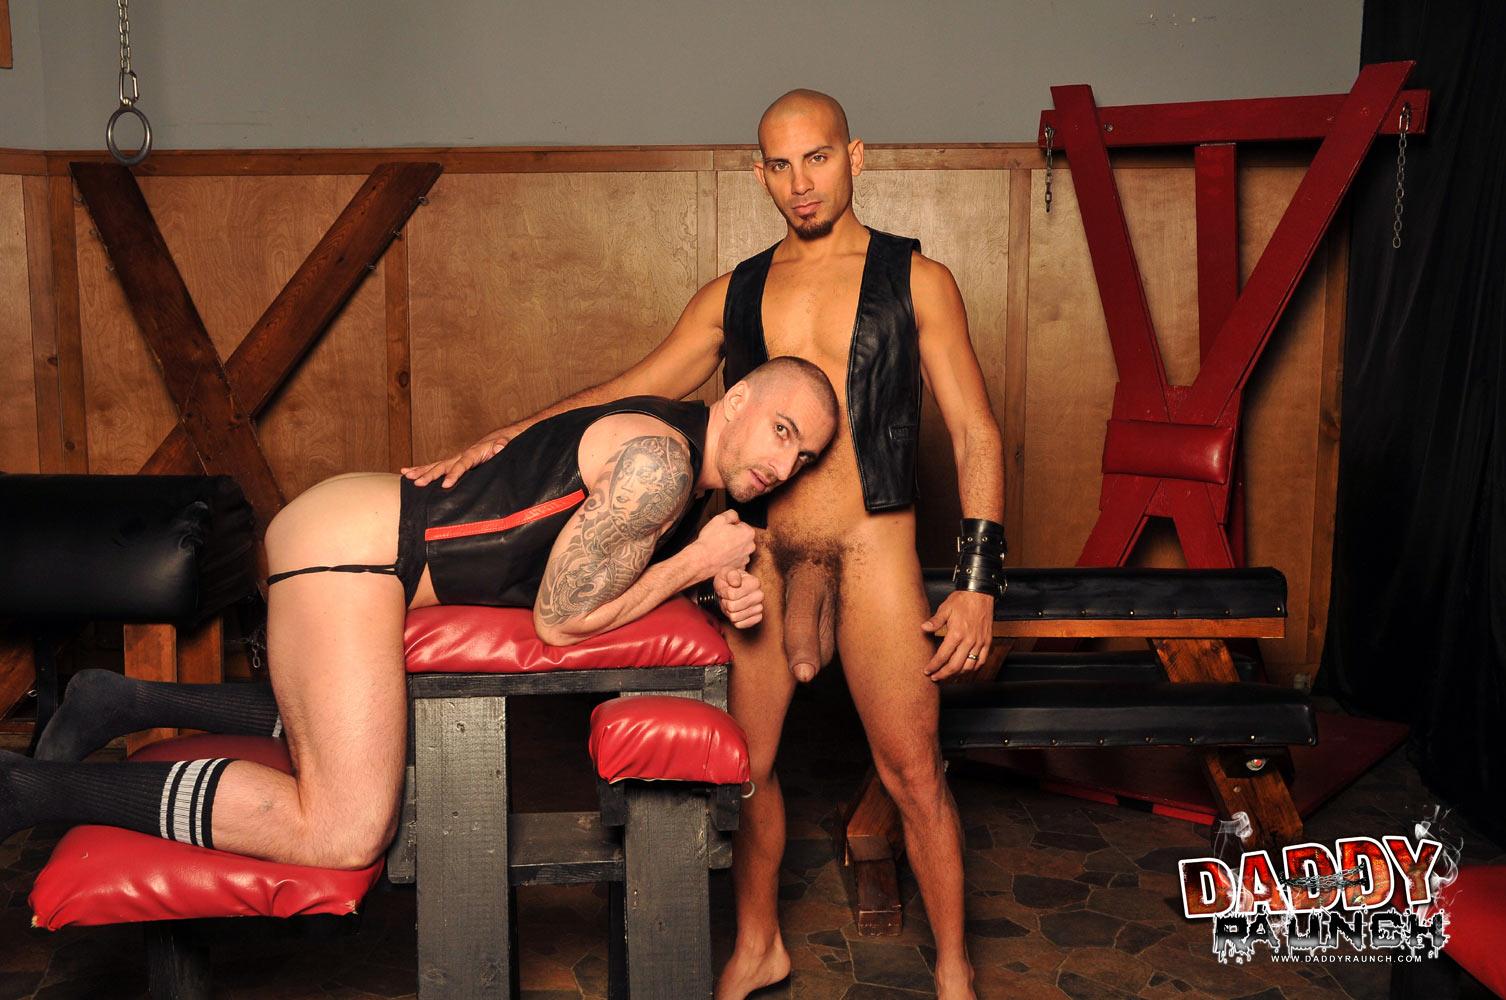 "Daddy-Raunch-Antonio-Biaggi-Kriss-Aston-Huge-Uncut-Cock-Barebacking-Amateur-Gay-Porn-05 Antonio Biaggi Barebacks A Hot Daddy Ass With His 12"" Uncut Cock"